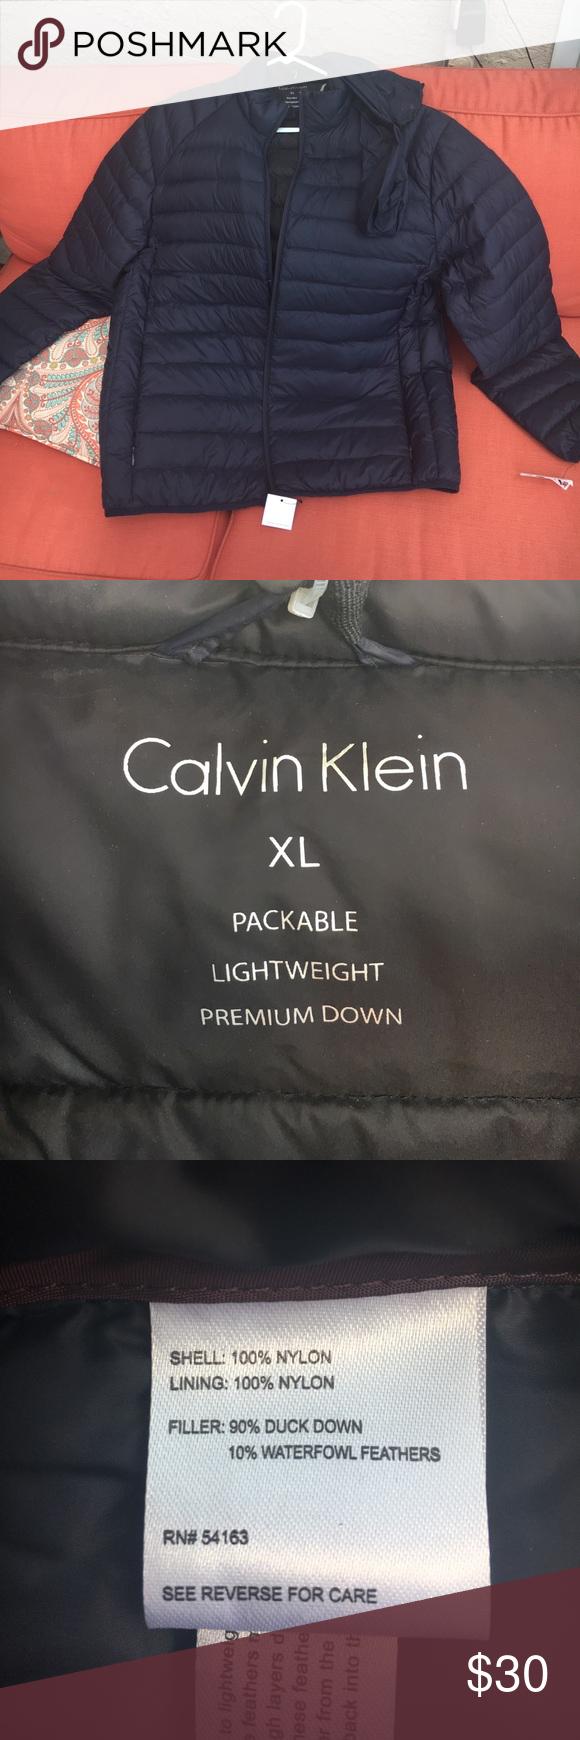 Down Jacket 7 Degrees Warmth Factor New Jackets Down Jacket Calvin Klein Men [ 1740 x 580 Pixel ]